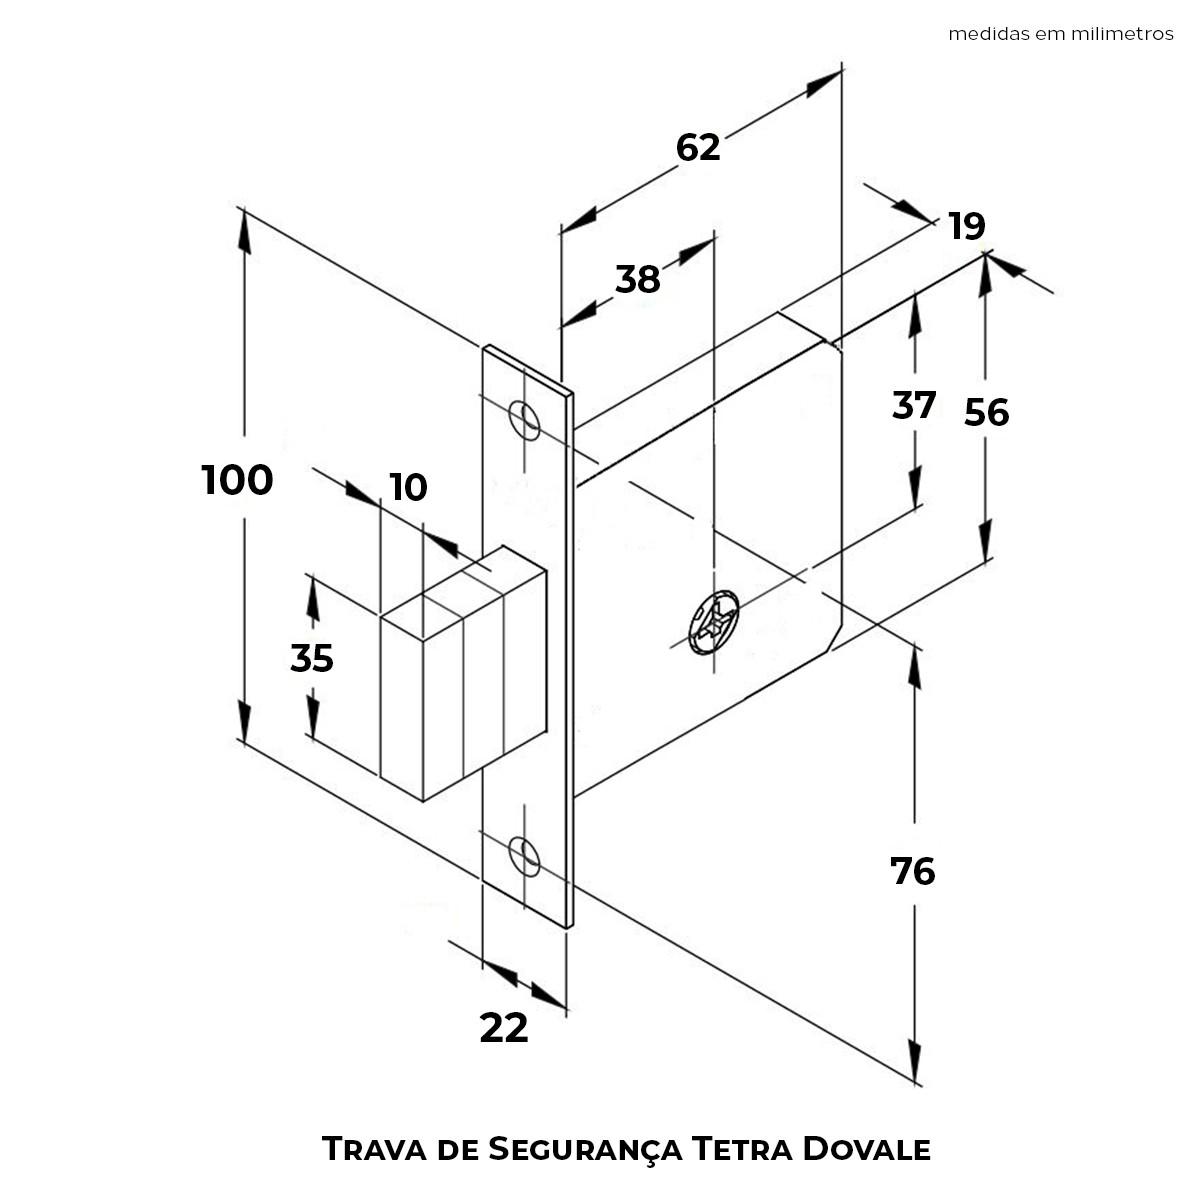 Trava de Segurança Dovale Tetra Cromada Nacional Cilindro e Chave Zamac - 78400